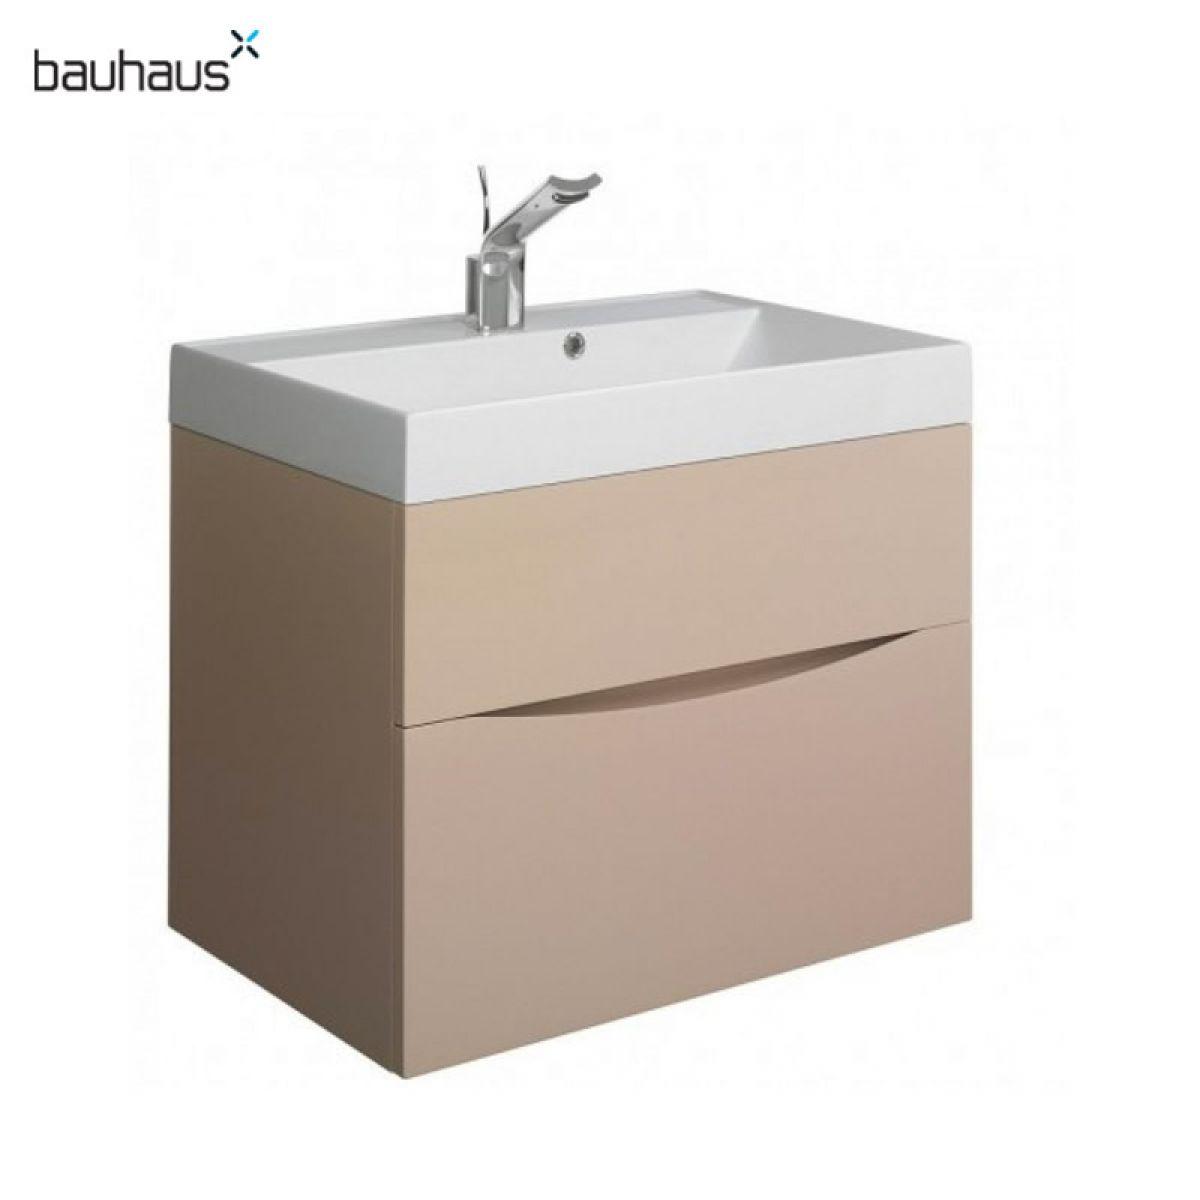 bauhaus glide ii 70 wall hung vanity unit with basin ukbathrooms